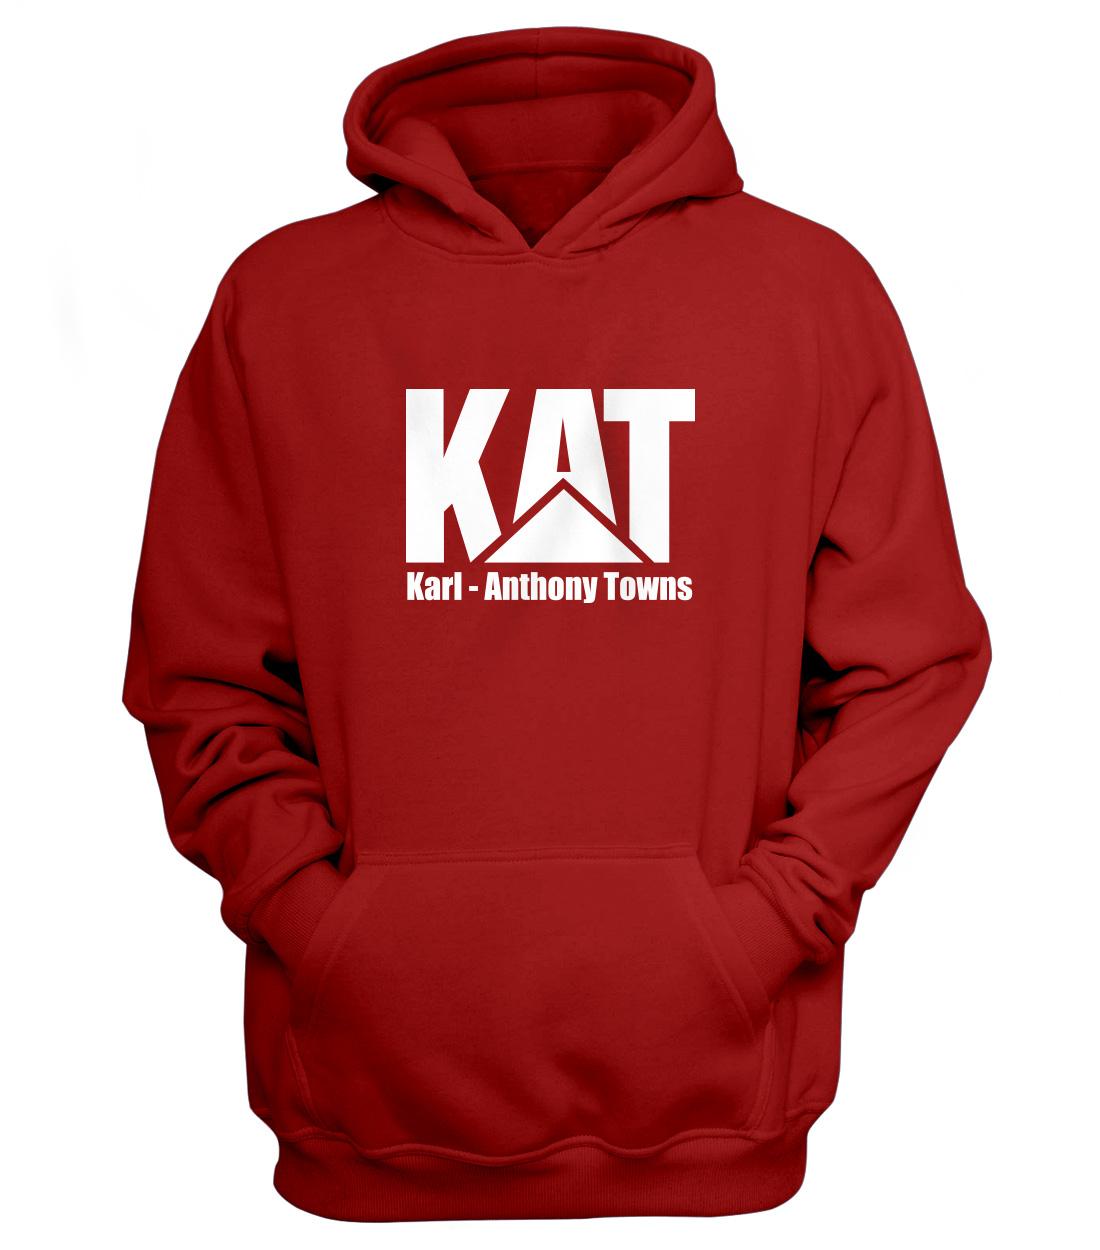 Karl Anthony Towns Hoodie (HD-RED-NP-kat-logo-616)